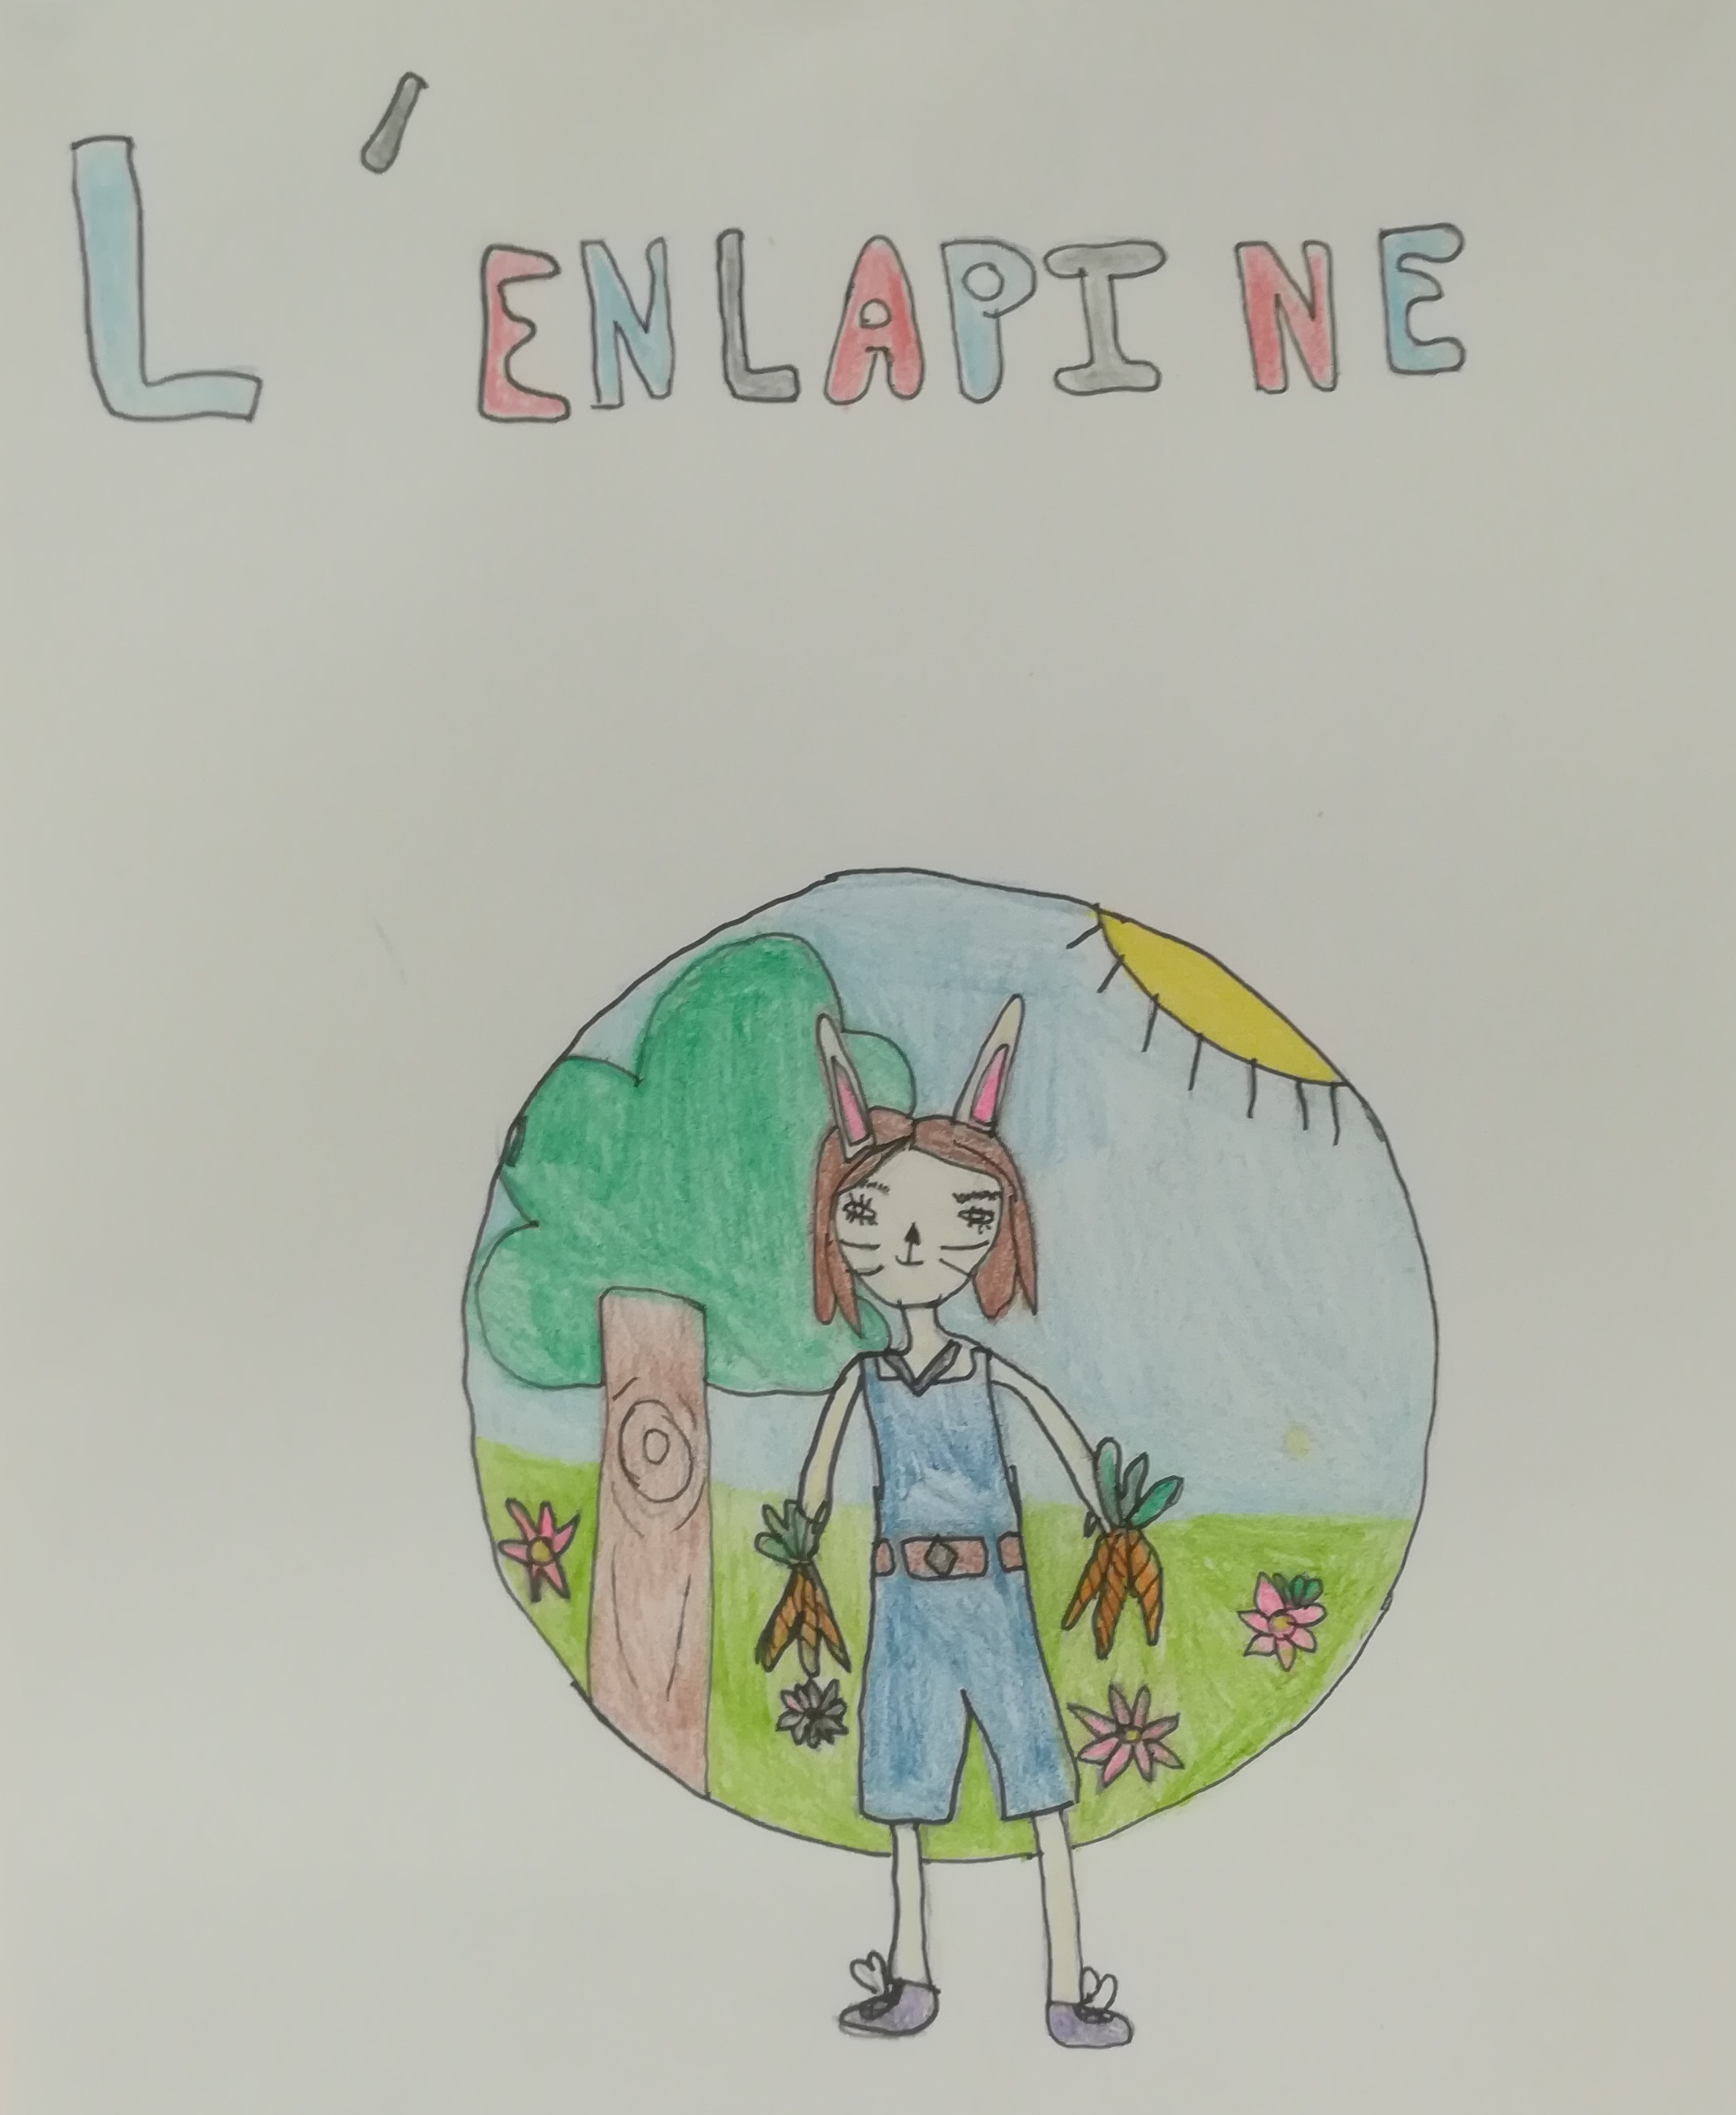 1 L'enlapine